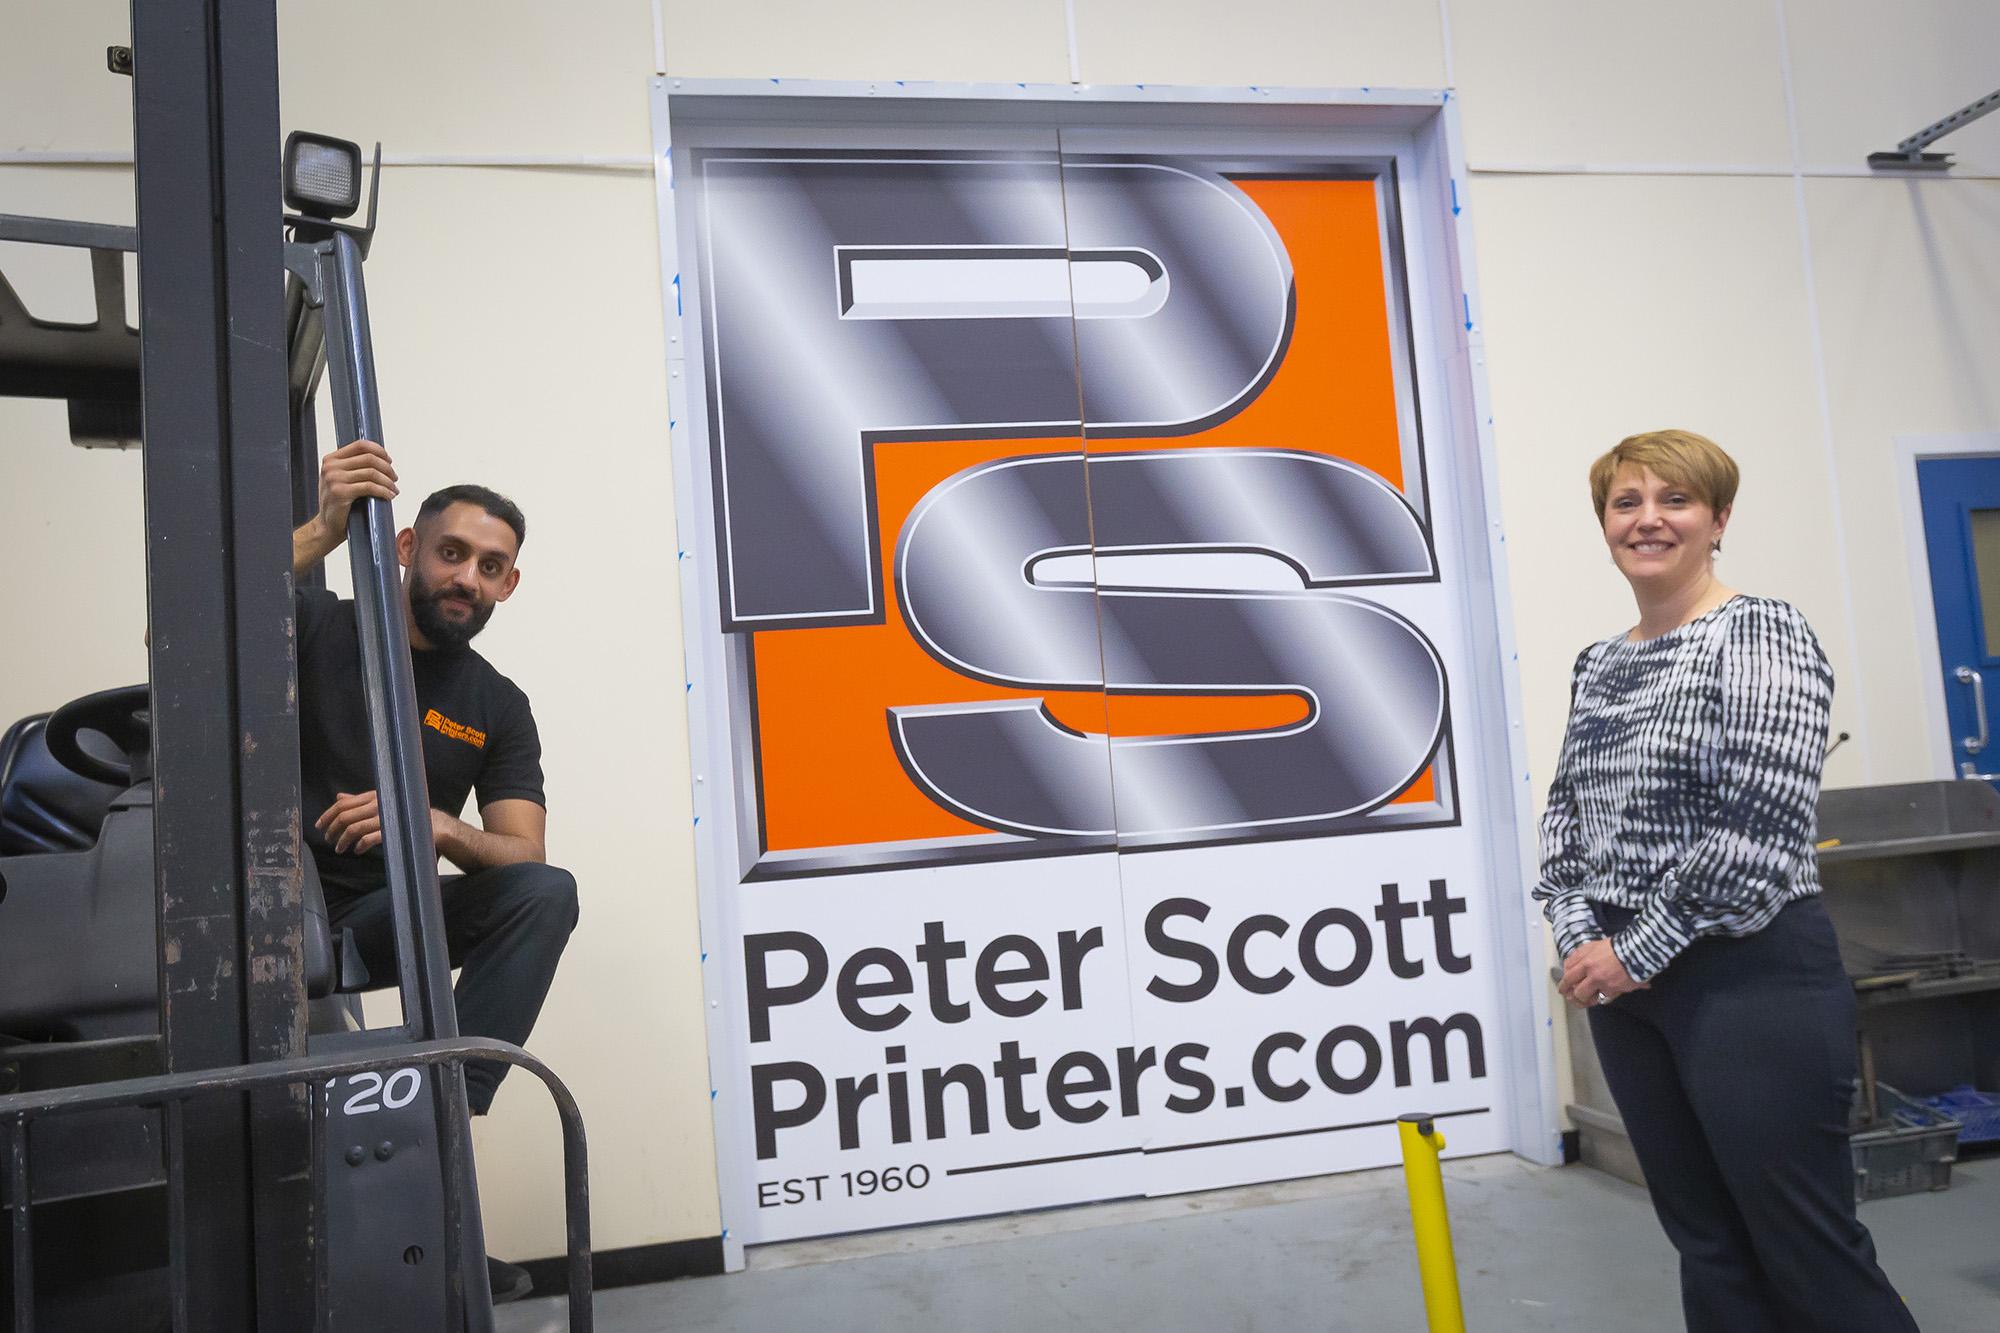 Peter Scott Printers: Training the Next Generation